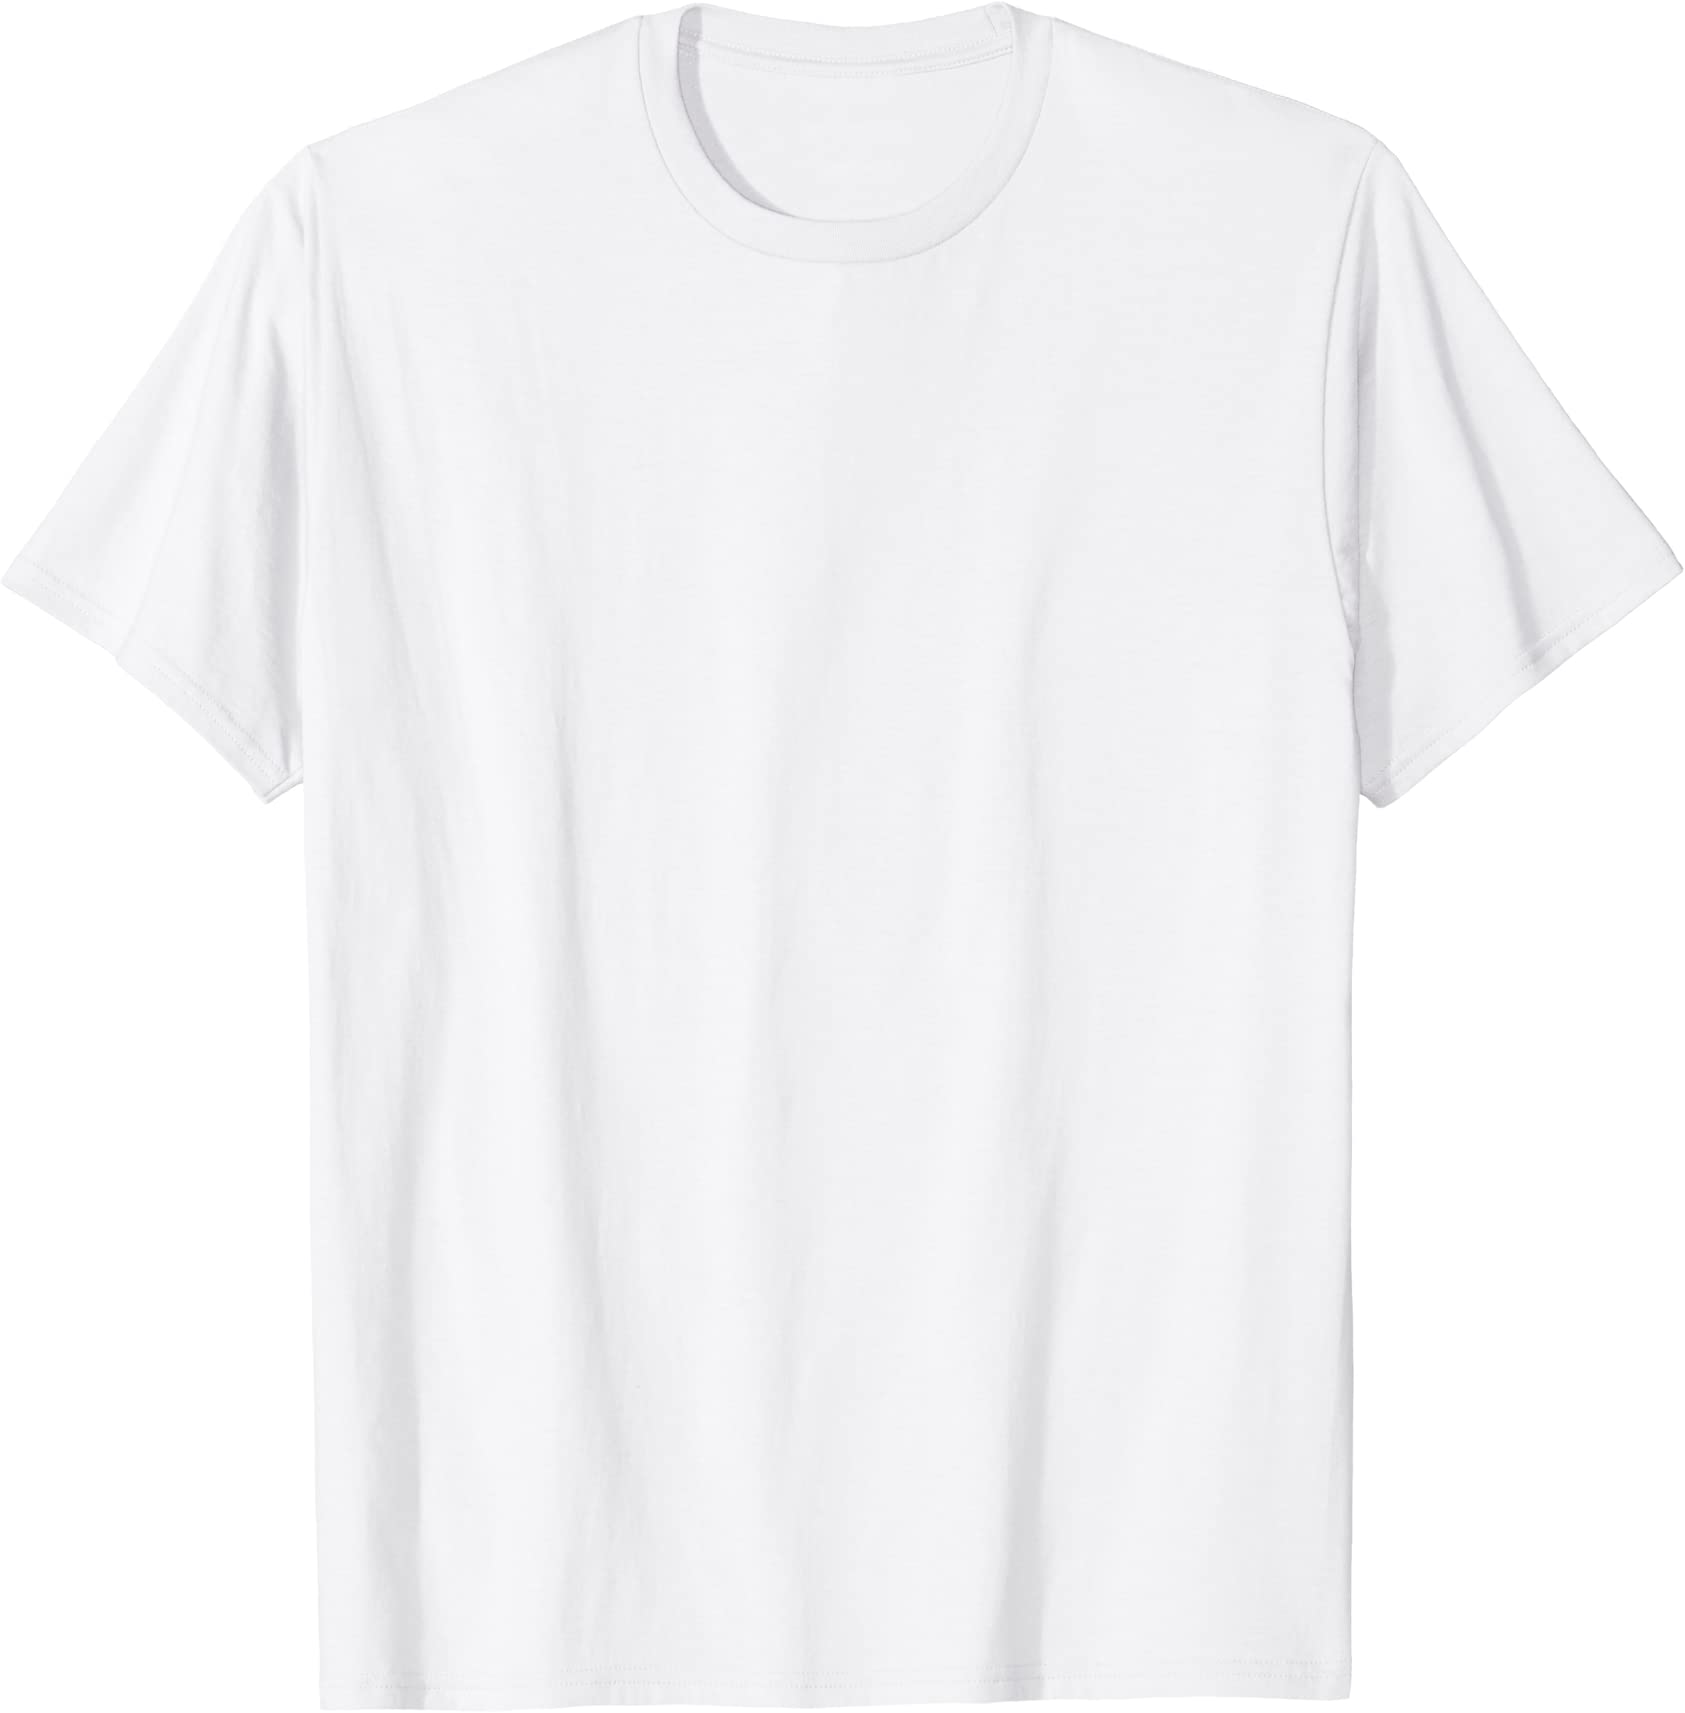 Daddio Of the Patio Mens 100/% Cotton Fun T-Shirt Summer Funny Tshirt Men Tee Shi